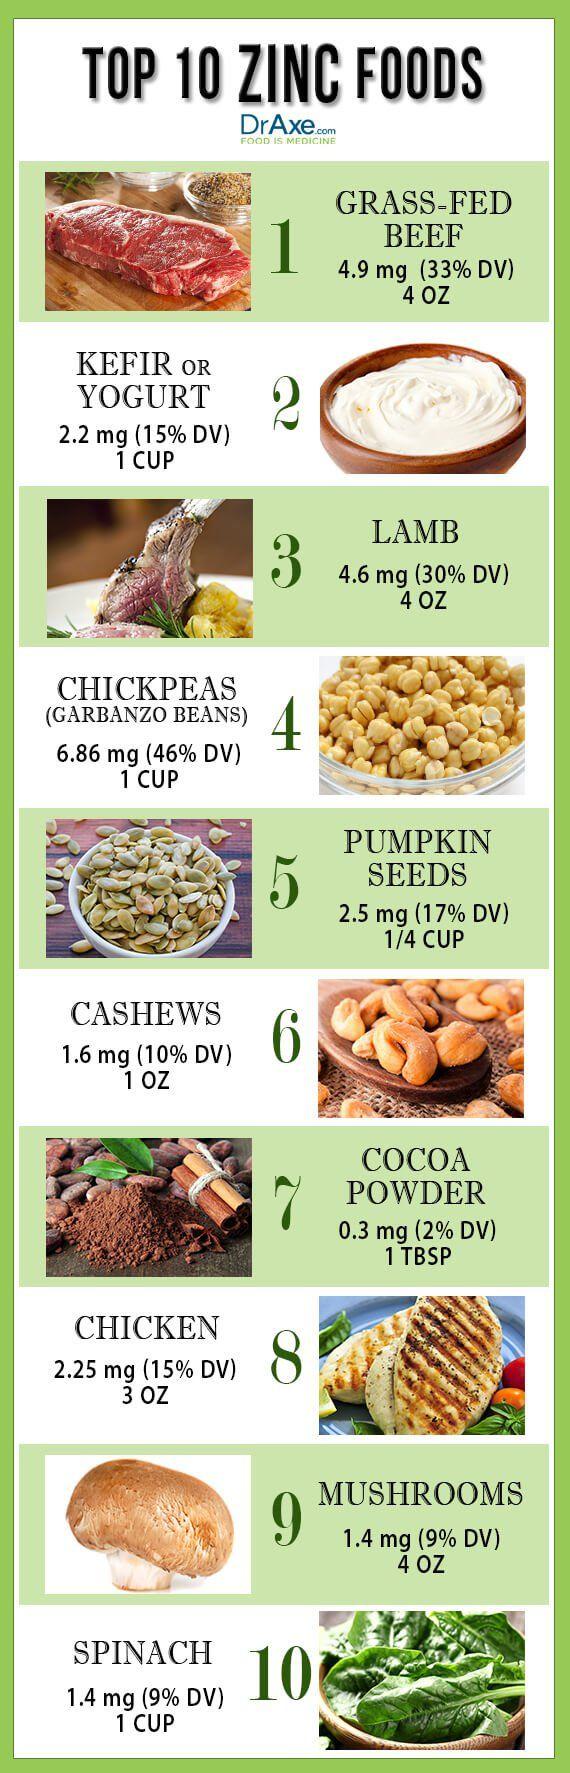 Zinc Benefits, Dosage, Foods, Supplements and Side